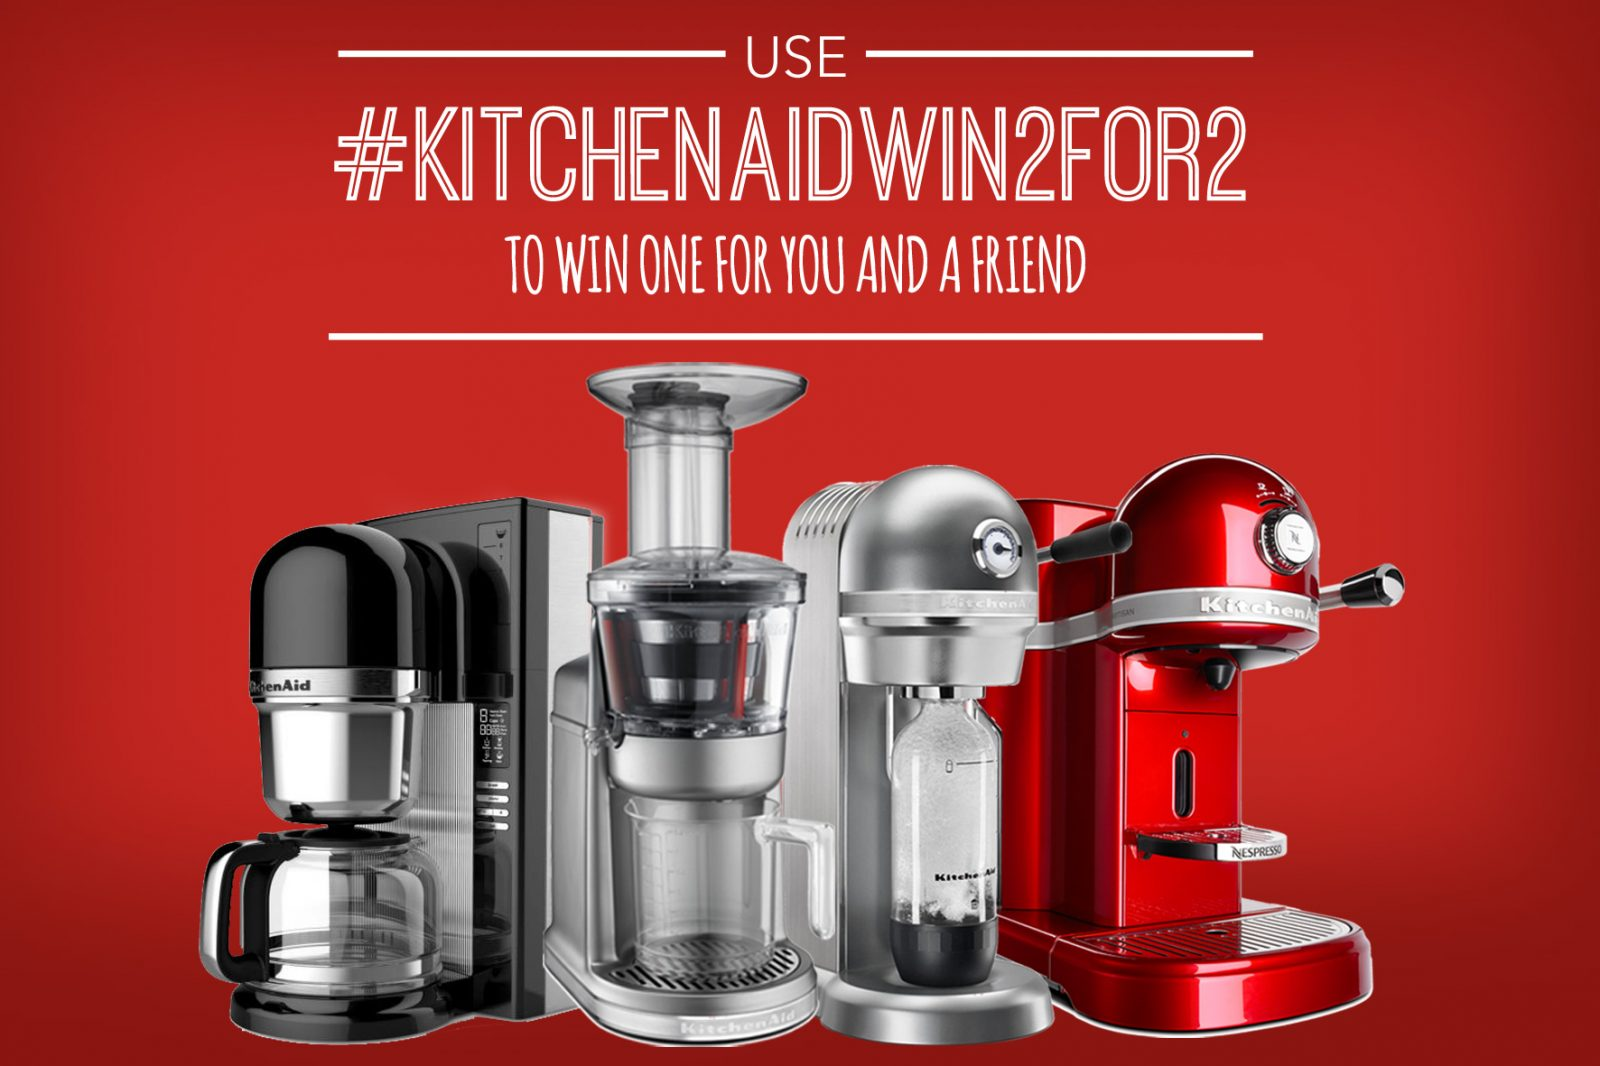 Kitchenaid Countertop Oven Youtube : WIN 2 FOR 2 KitchenAid? Beverage Contest - BLOG: UNITED WE CREATE